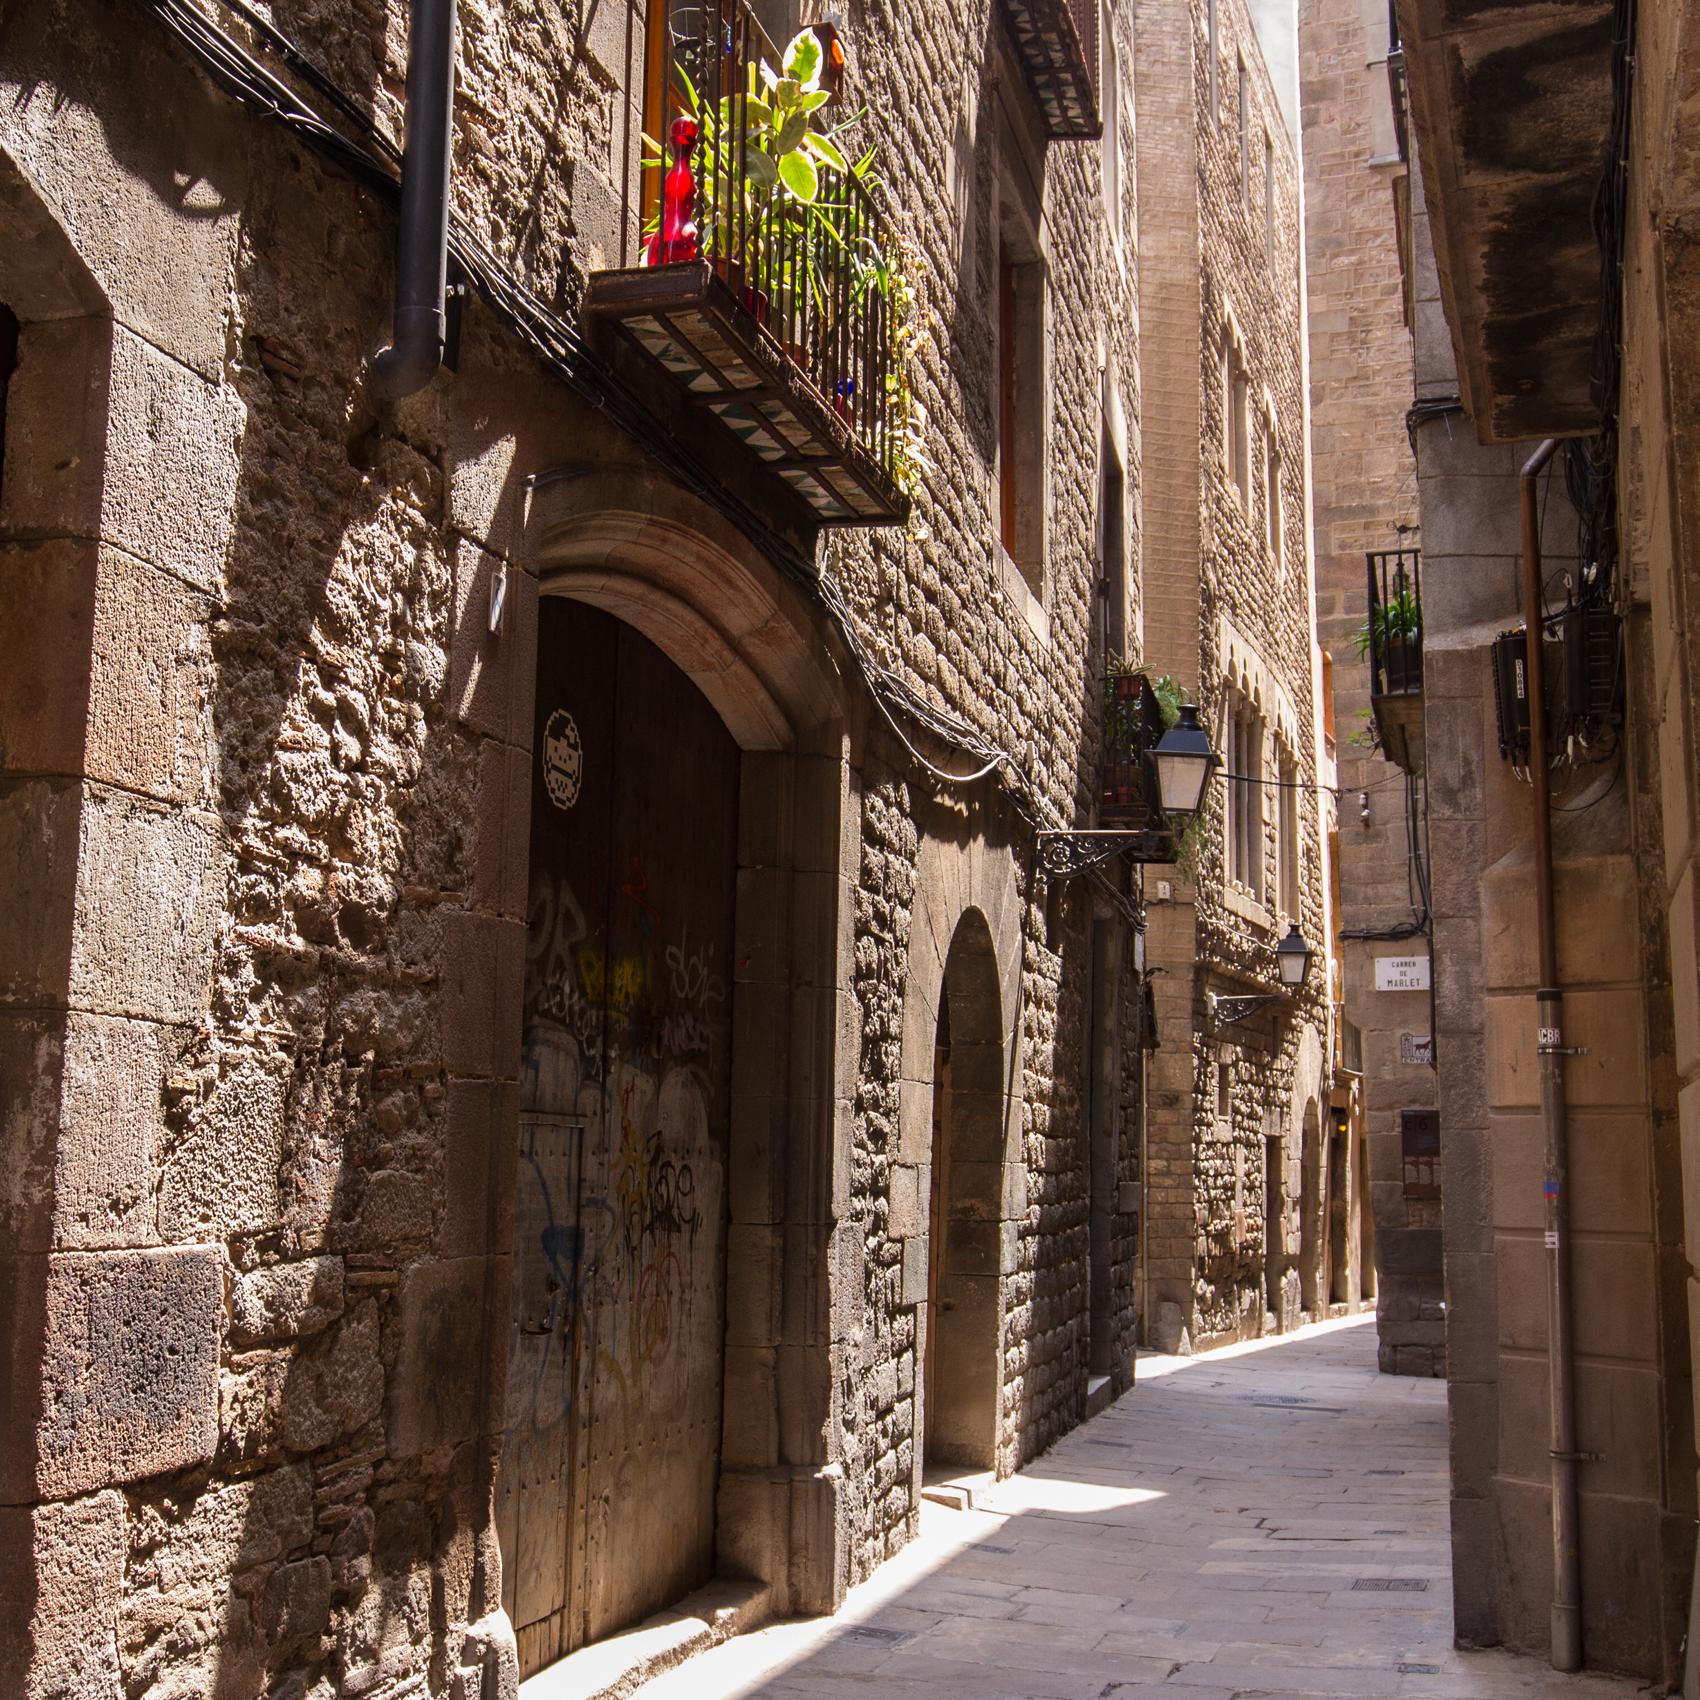 In the Jewish Quarter